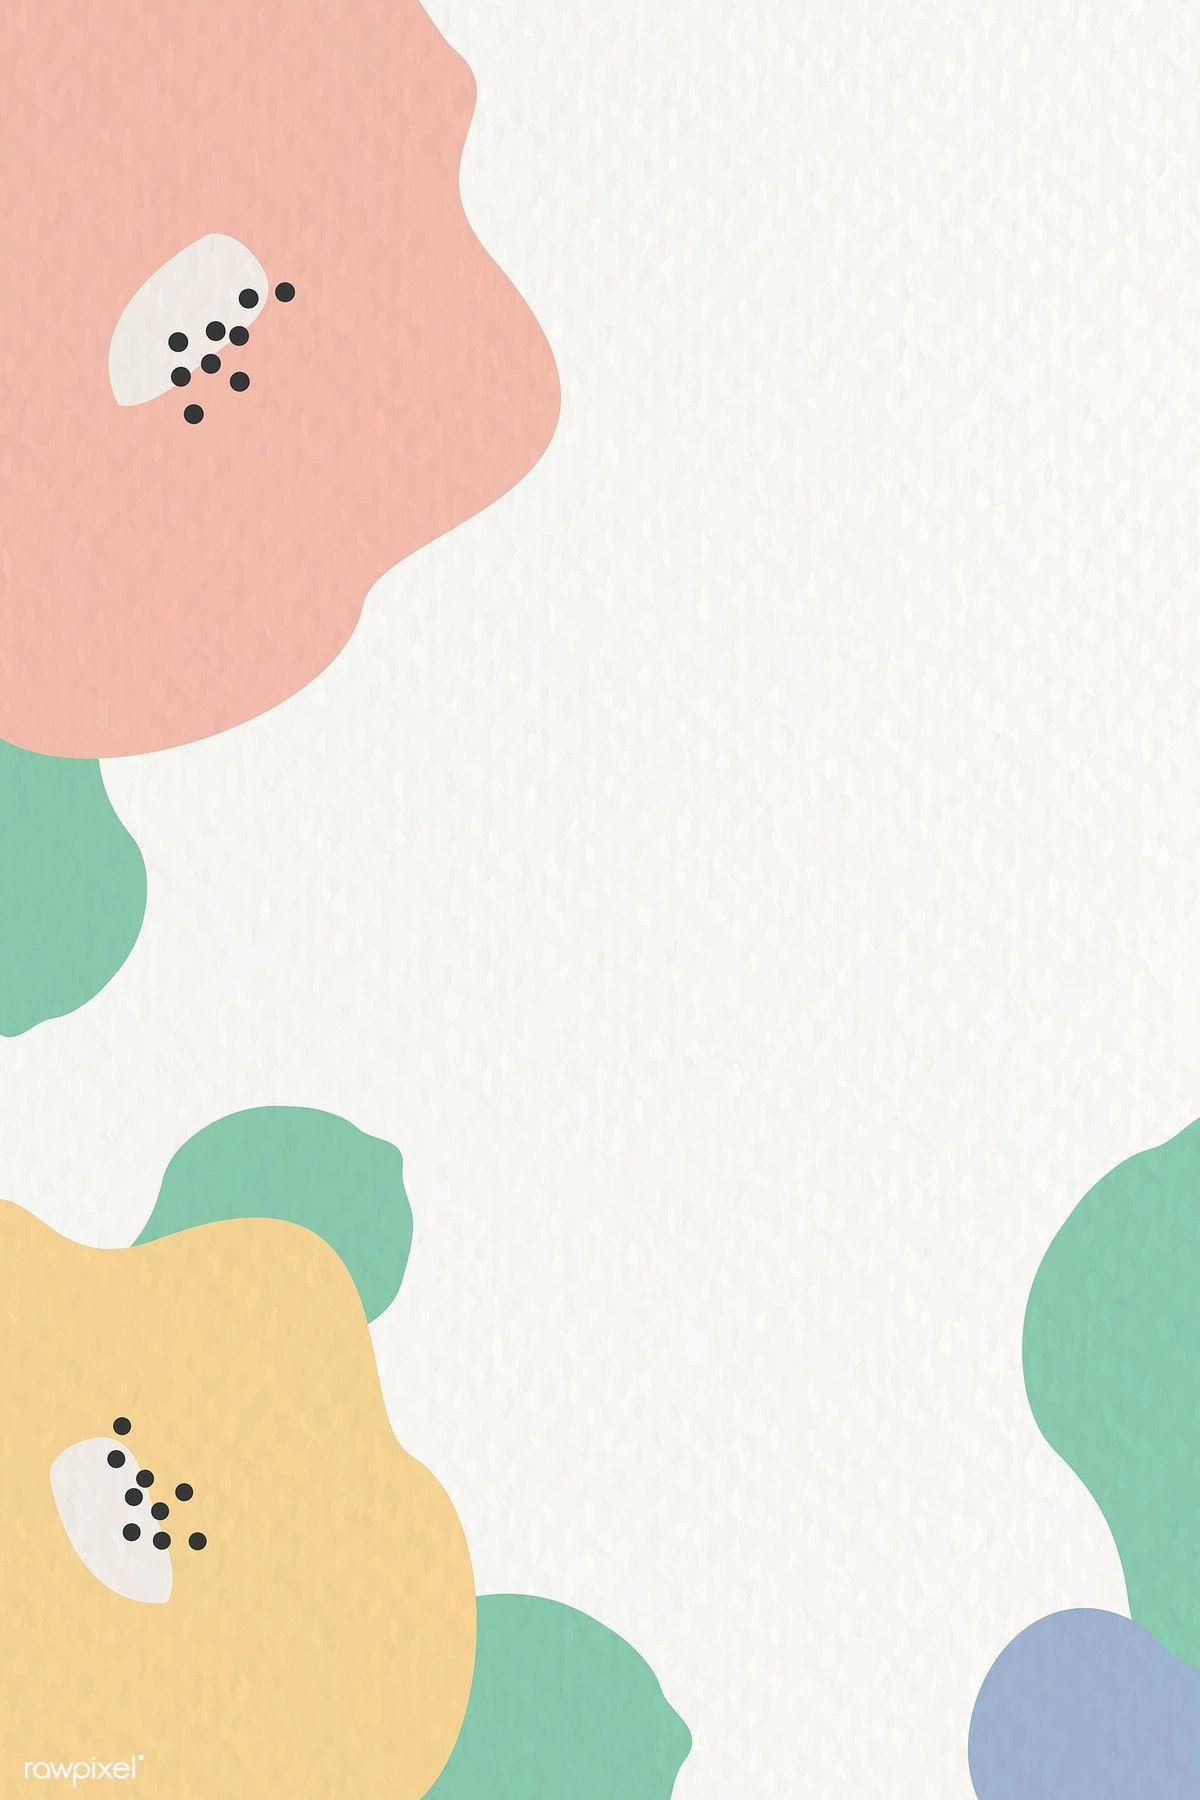 Download premium vector of Botanical pattern frame on beige background